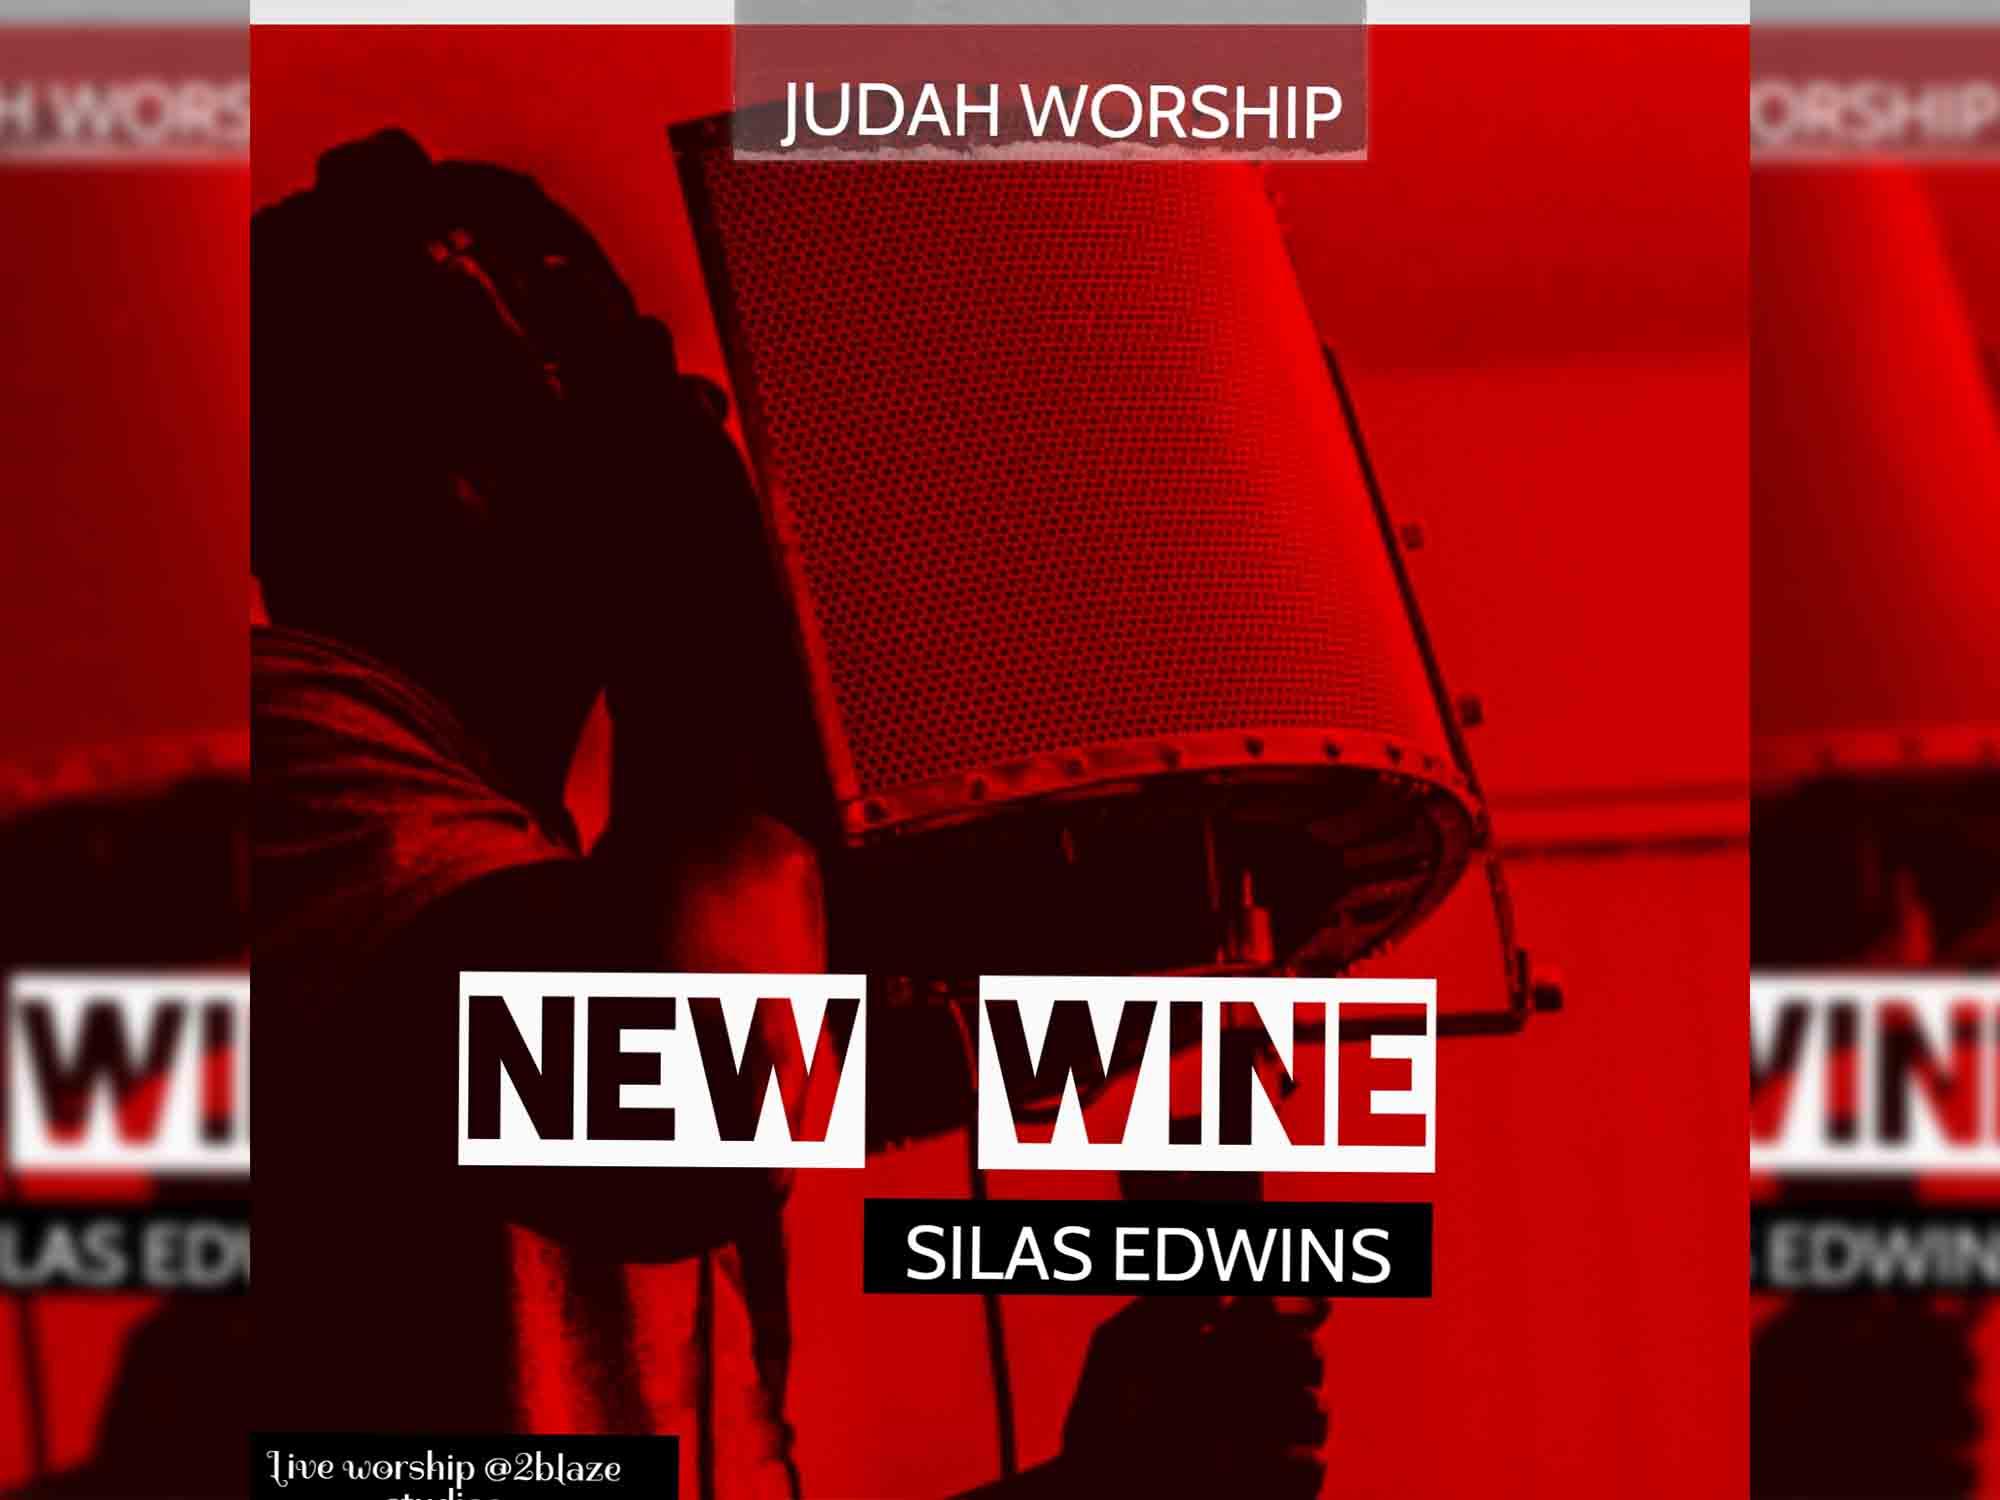 New Wine – Silas Edwins Track art